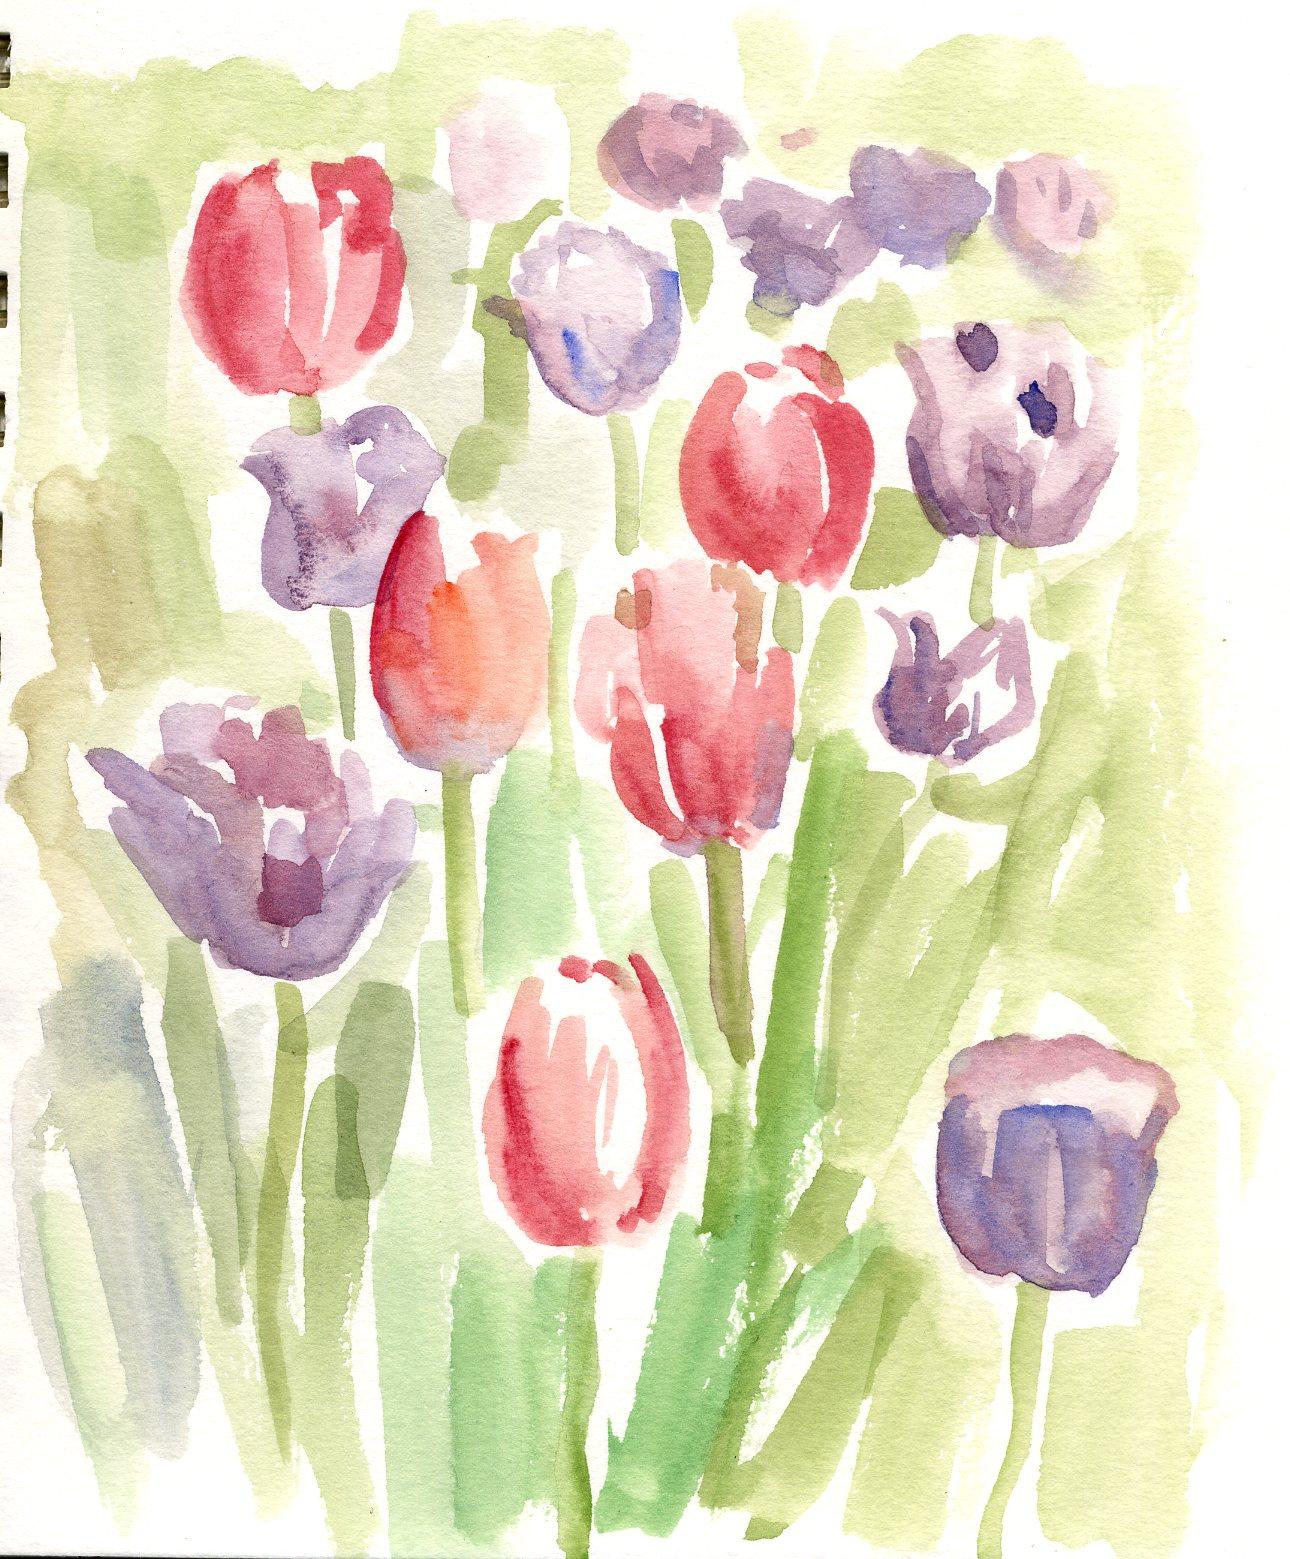 http://1.bp.blogspot.com/_tS0nYP5Bhn0/S-iVXkeUwcI/AAAAAAAABTQ/zh-o447OD_4/s1600/tulips.jpg